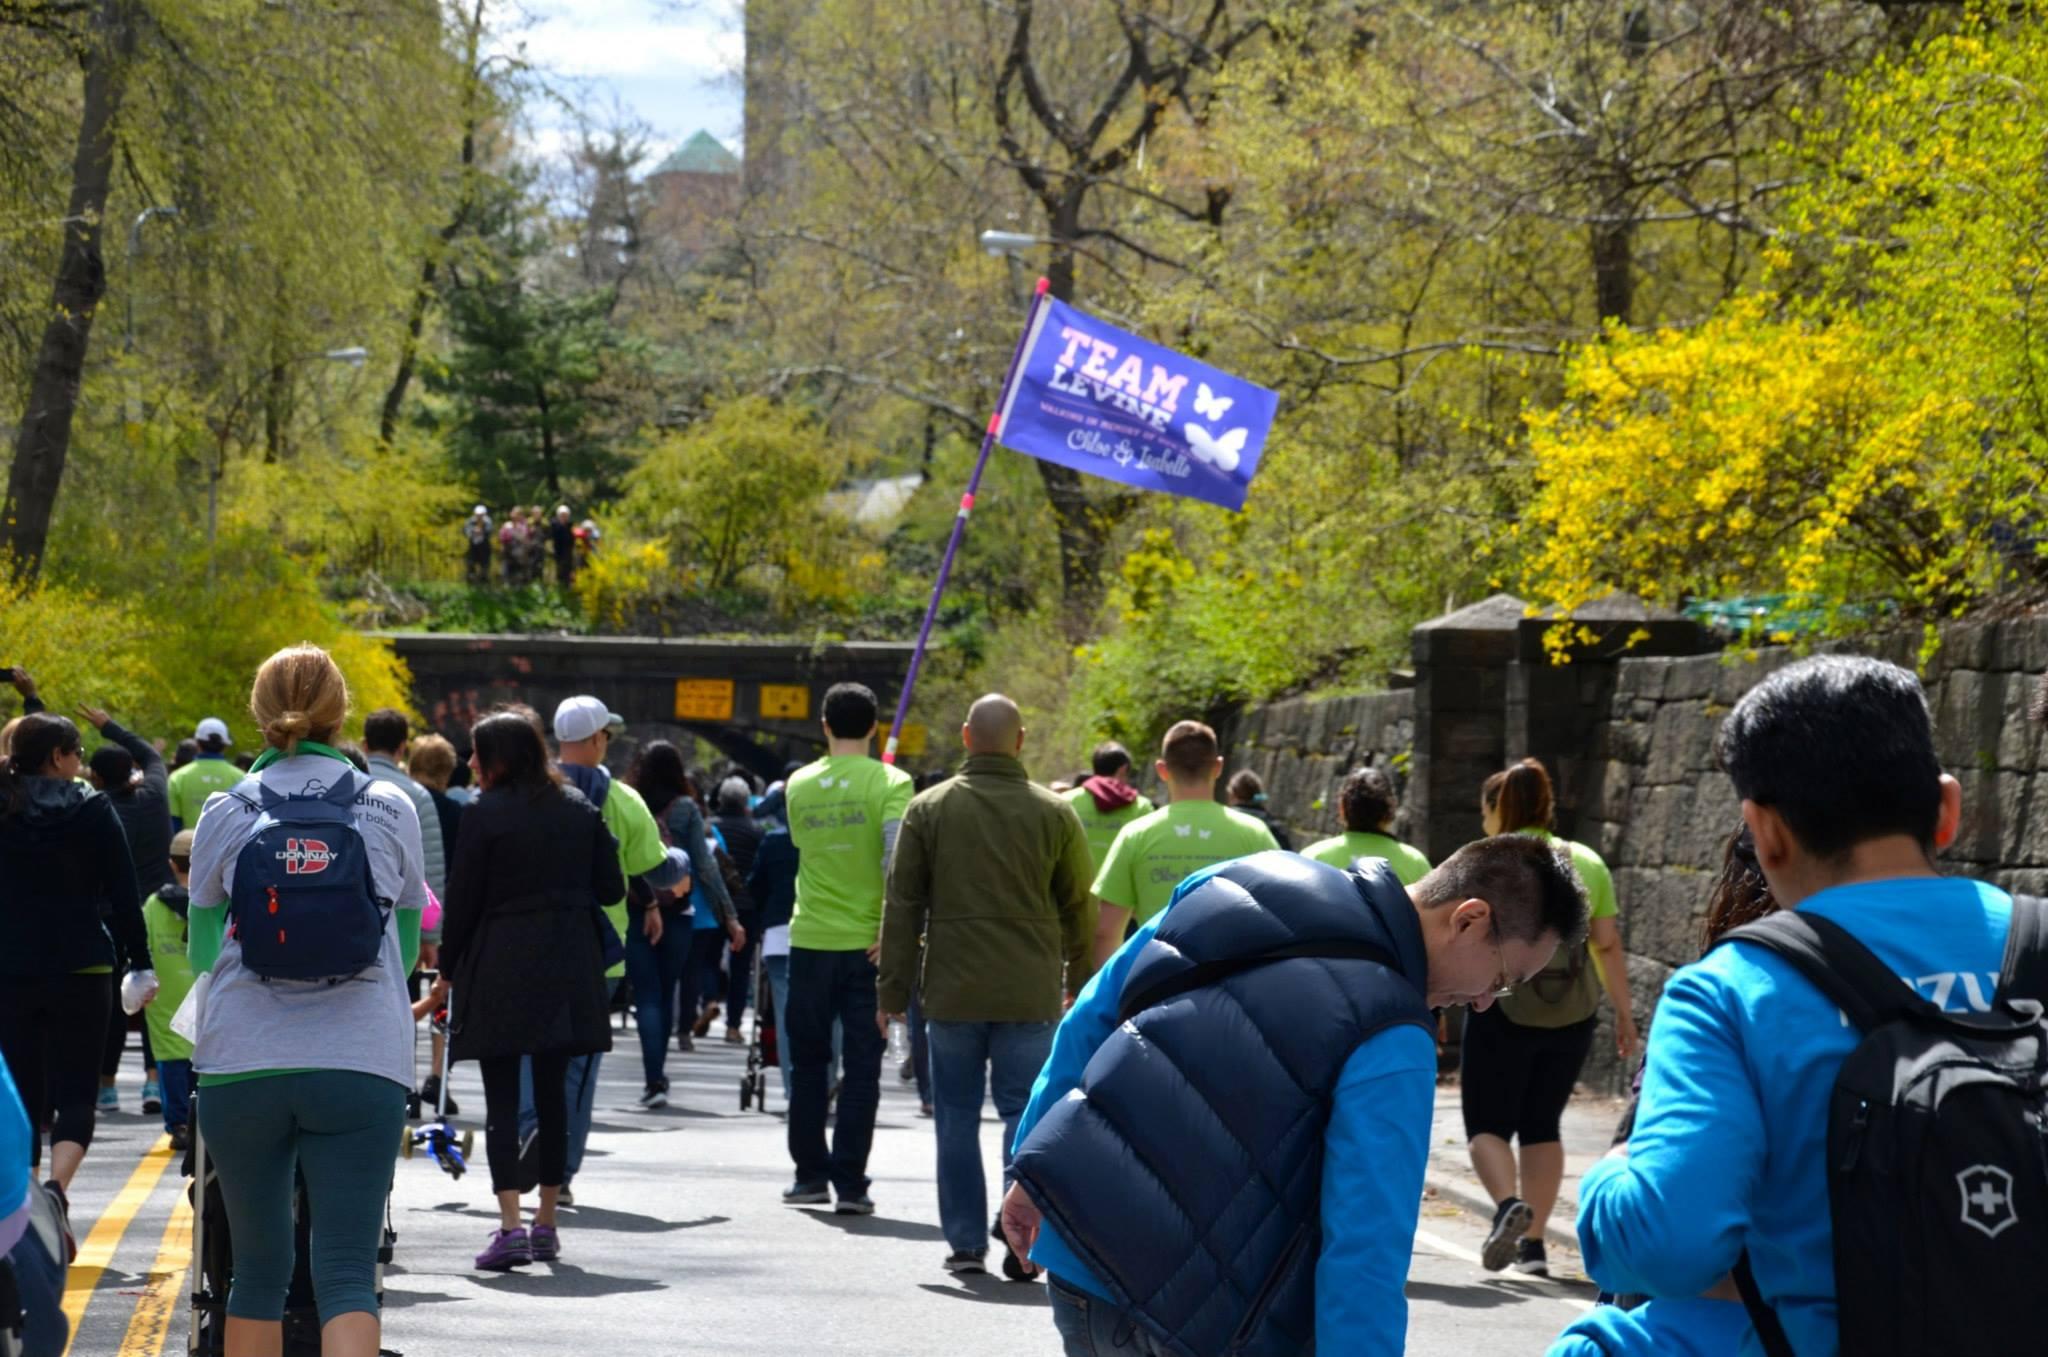 2015-march-for-babies-walk_16710135307_o.jpg